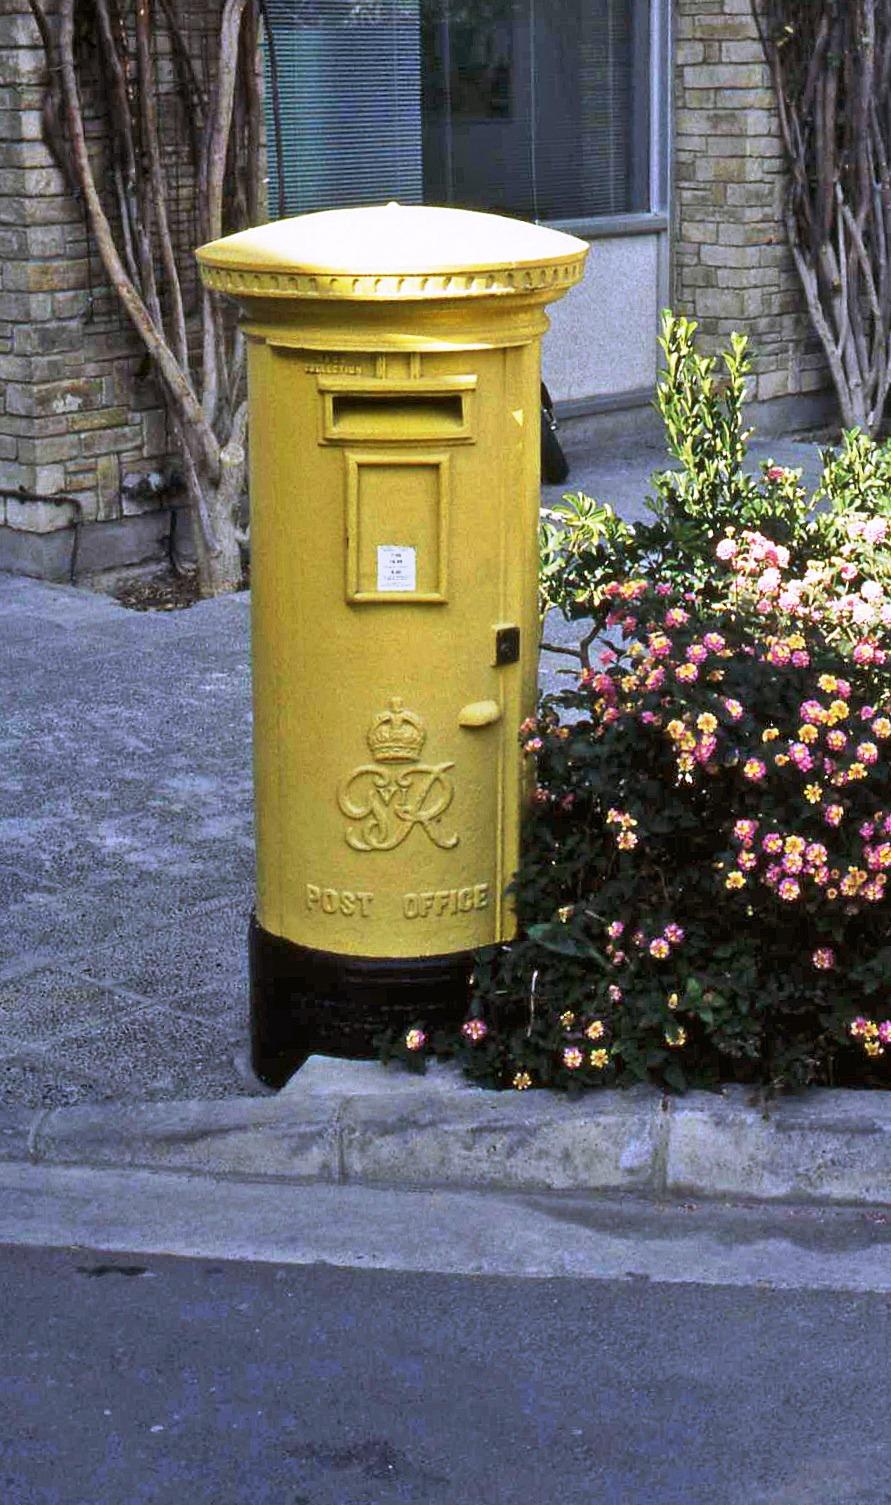 File:Yellow old Brittish postbox on Cyprus.jpg